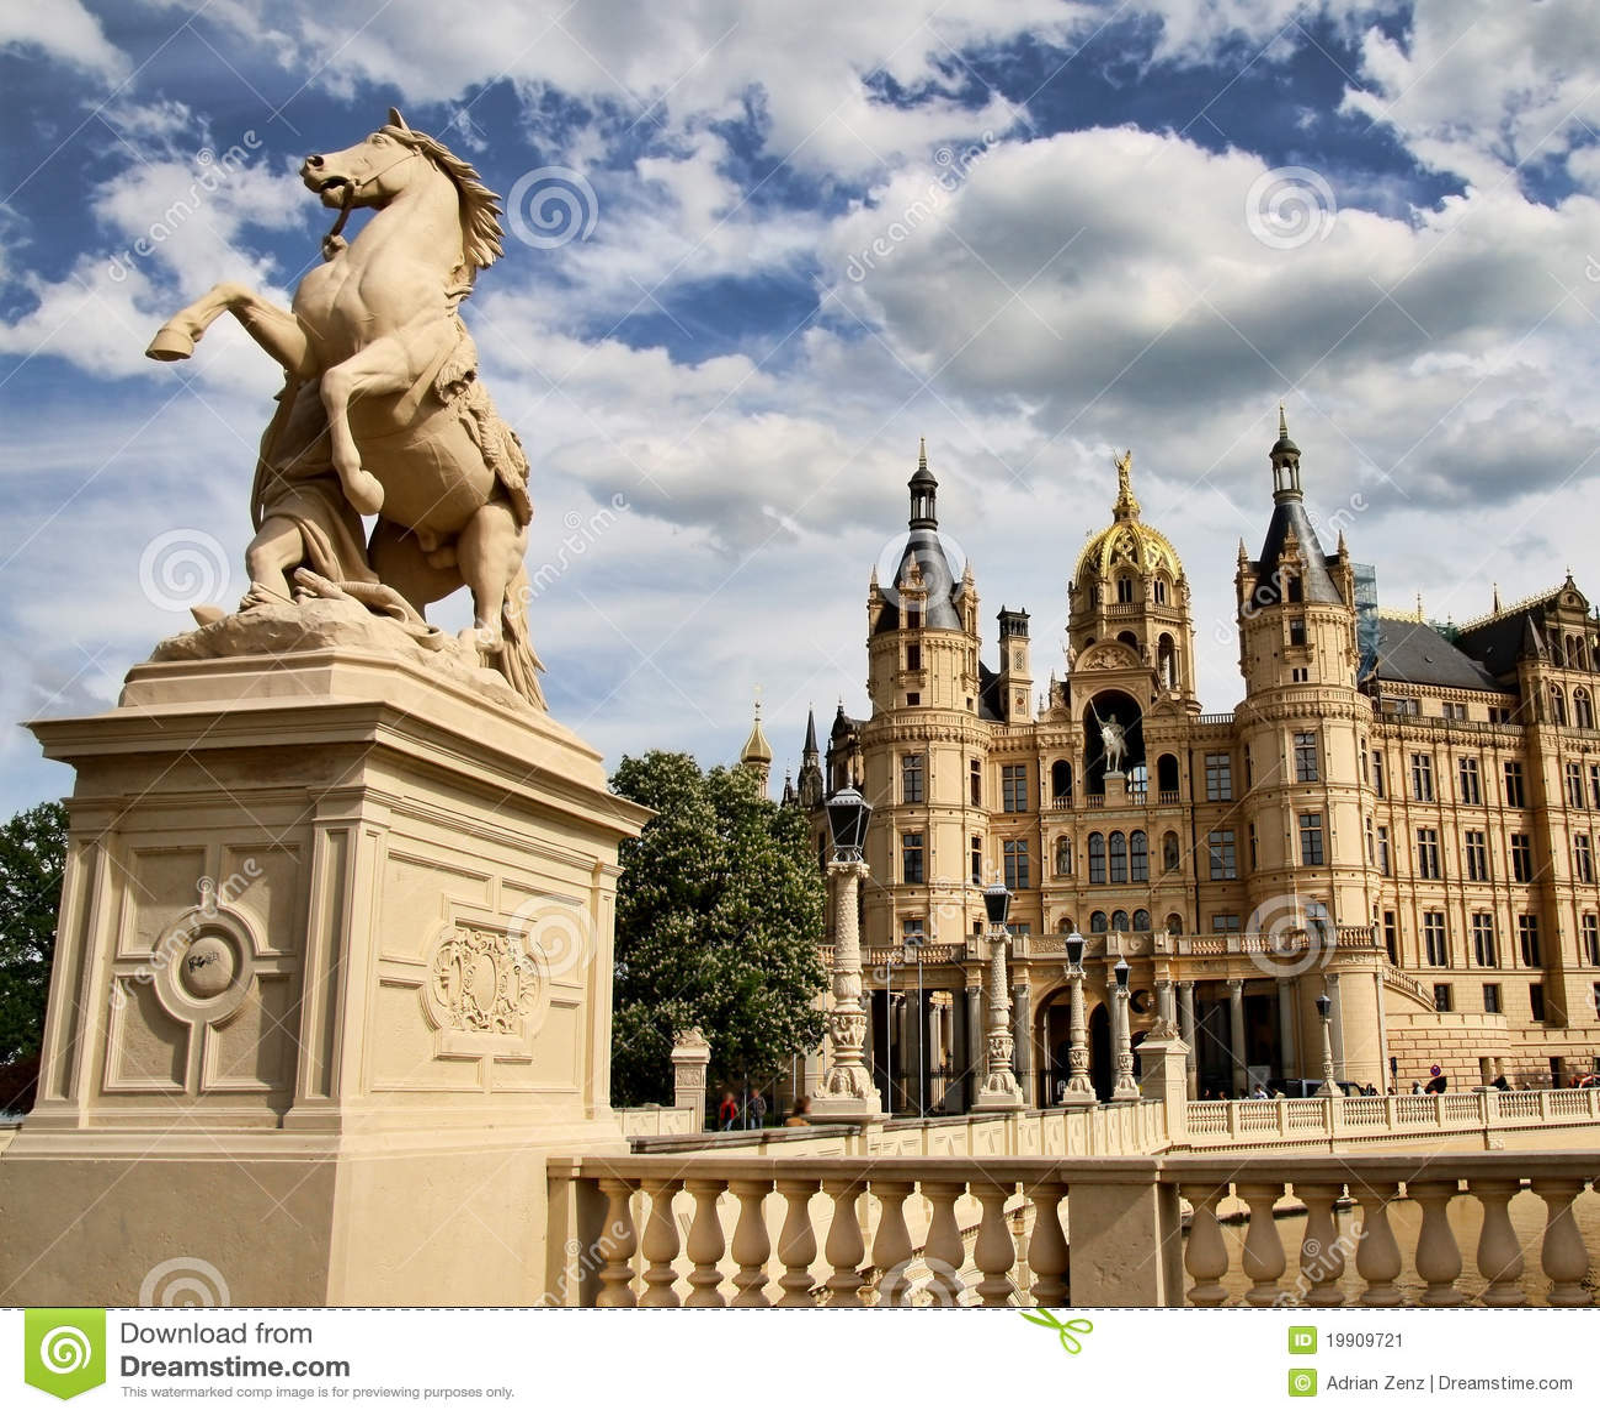 Castle of Schwerin, Northern Germany